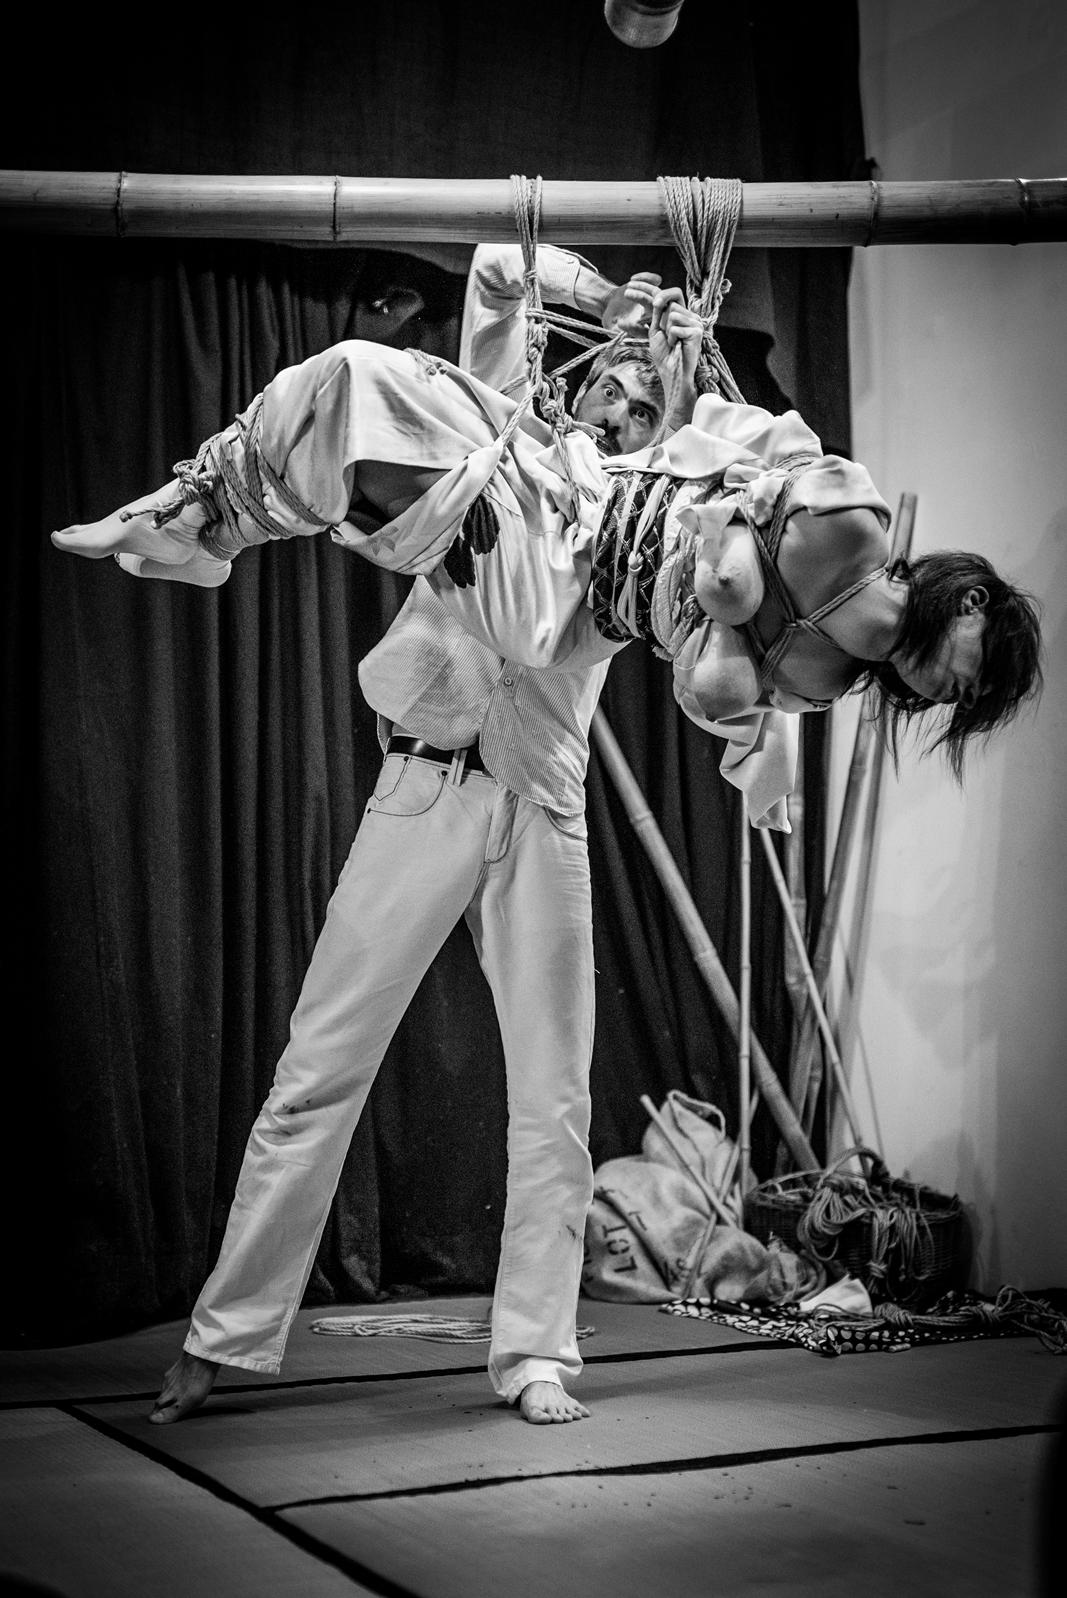 Performance bondage japonais Lyon 2017 Pyrrhus 10